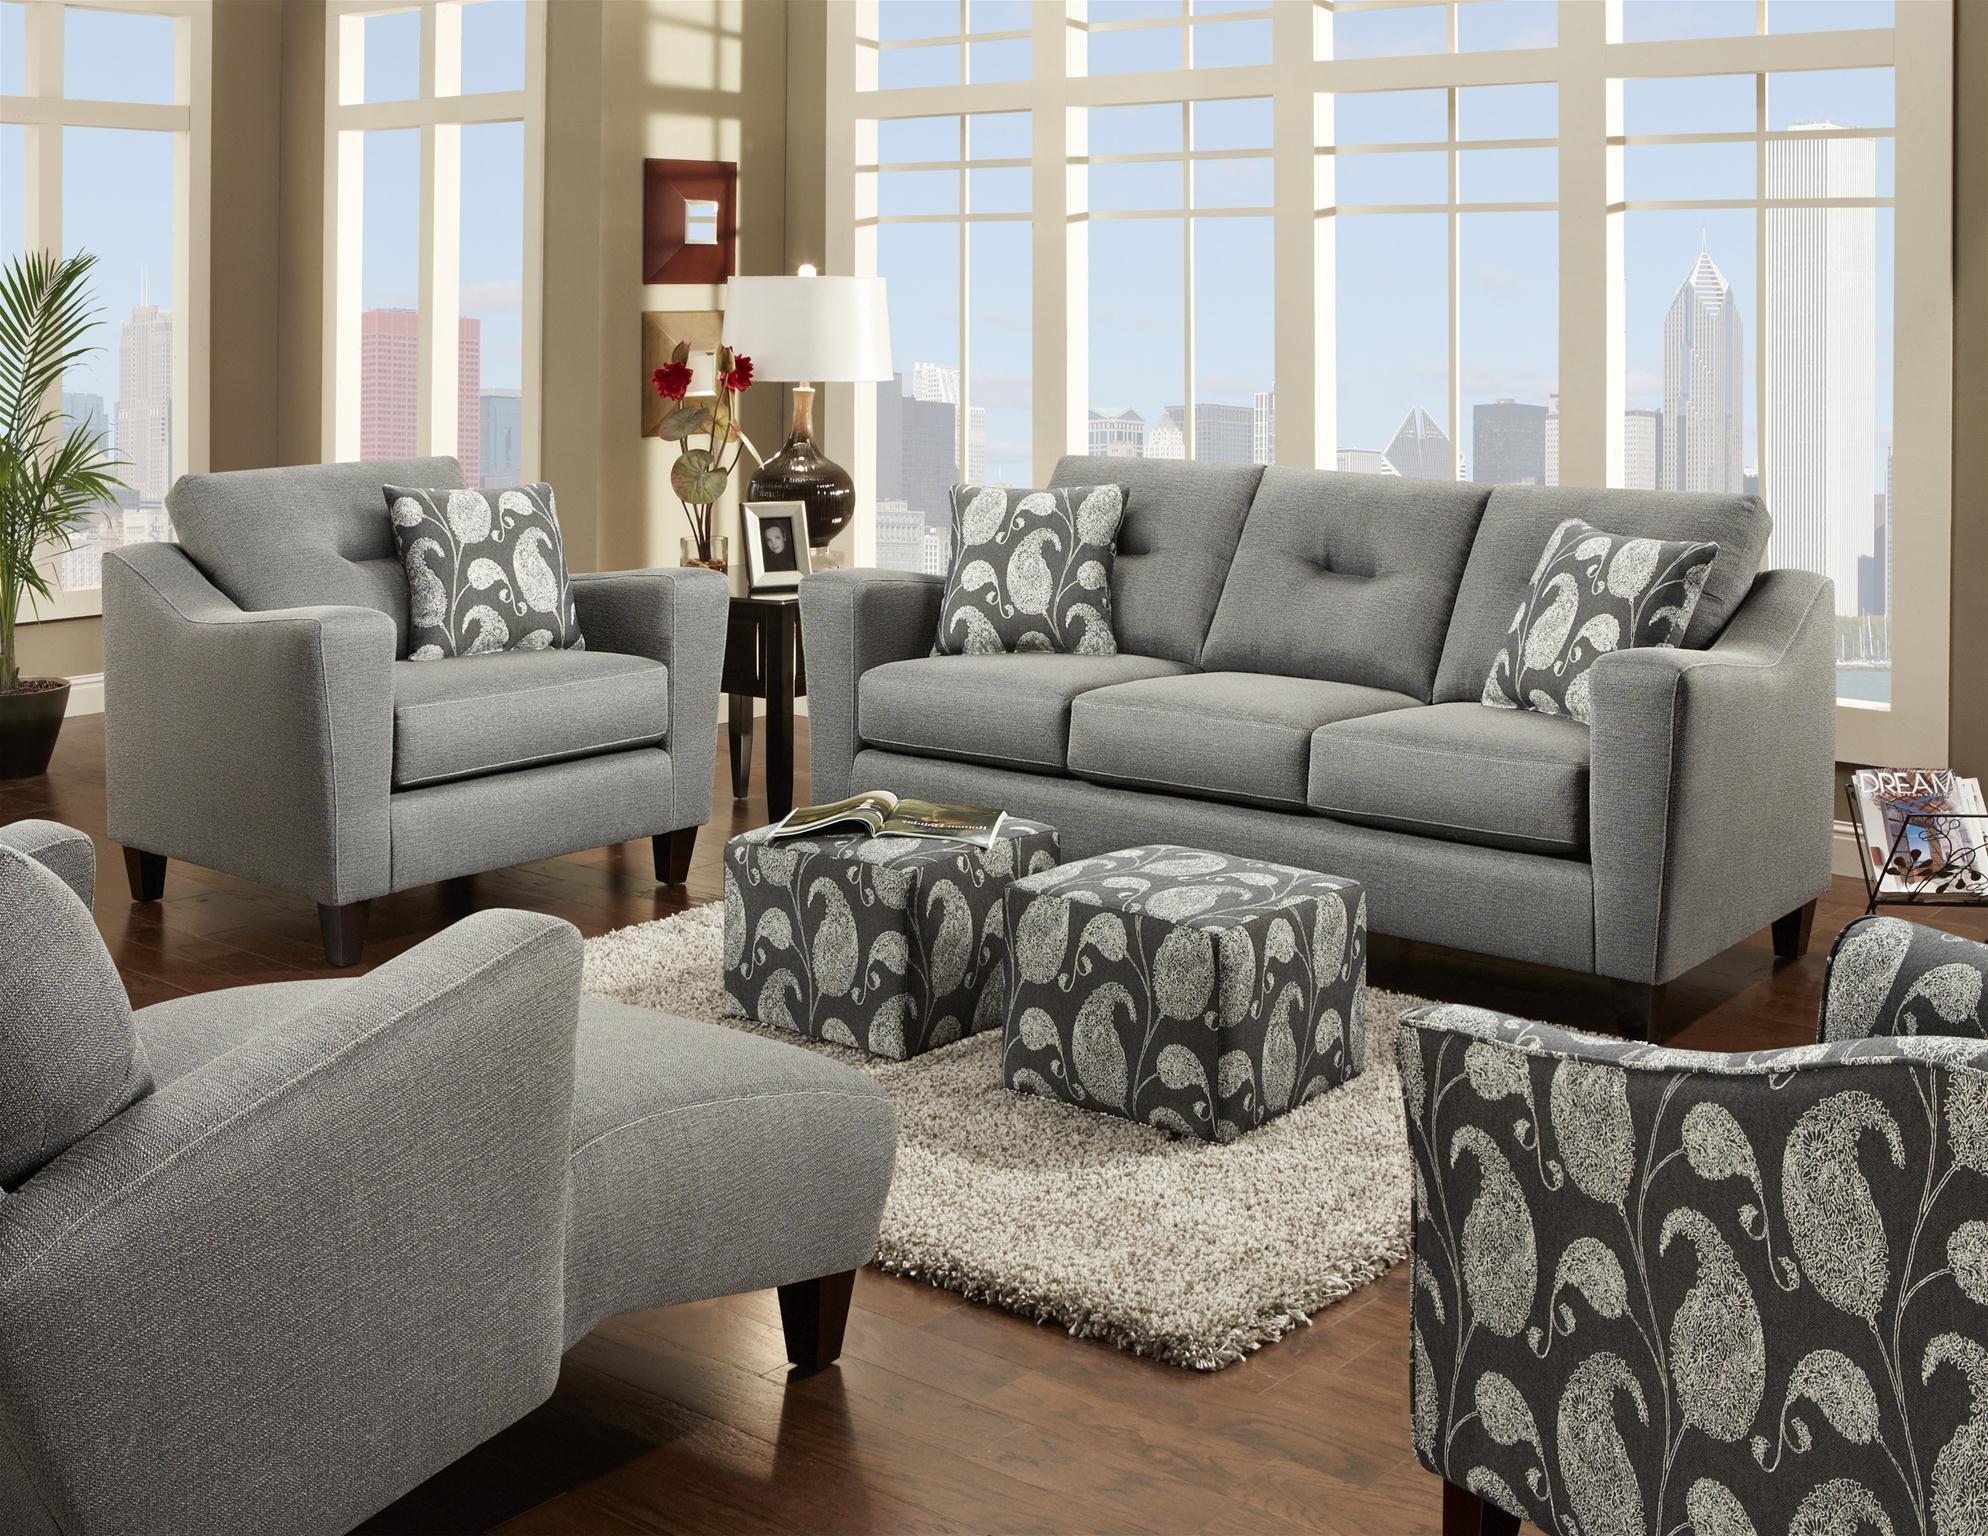 Attirant Fusion Living Room Chair 8102Apex Cinder At Priba Furniture And Interiors